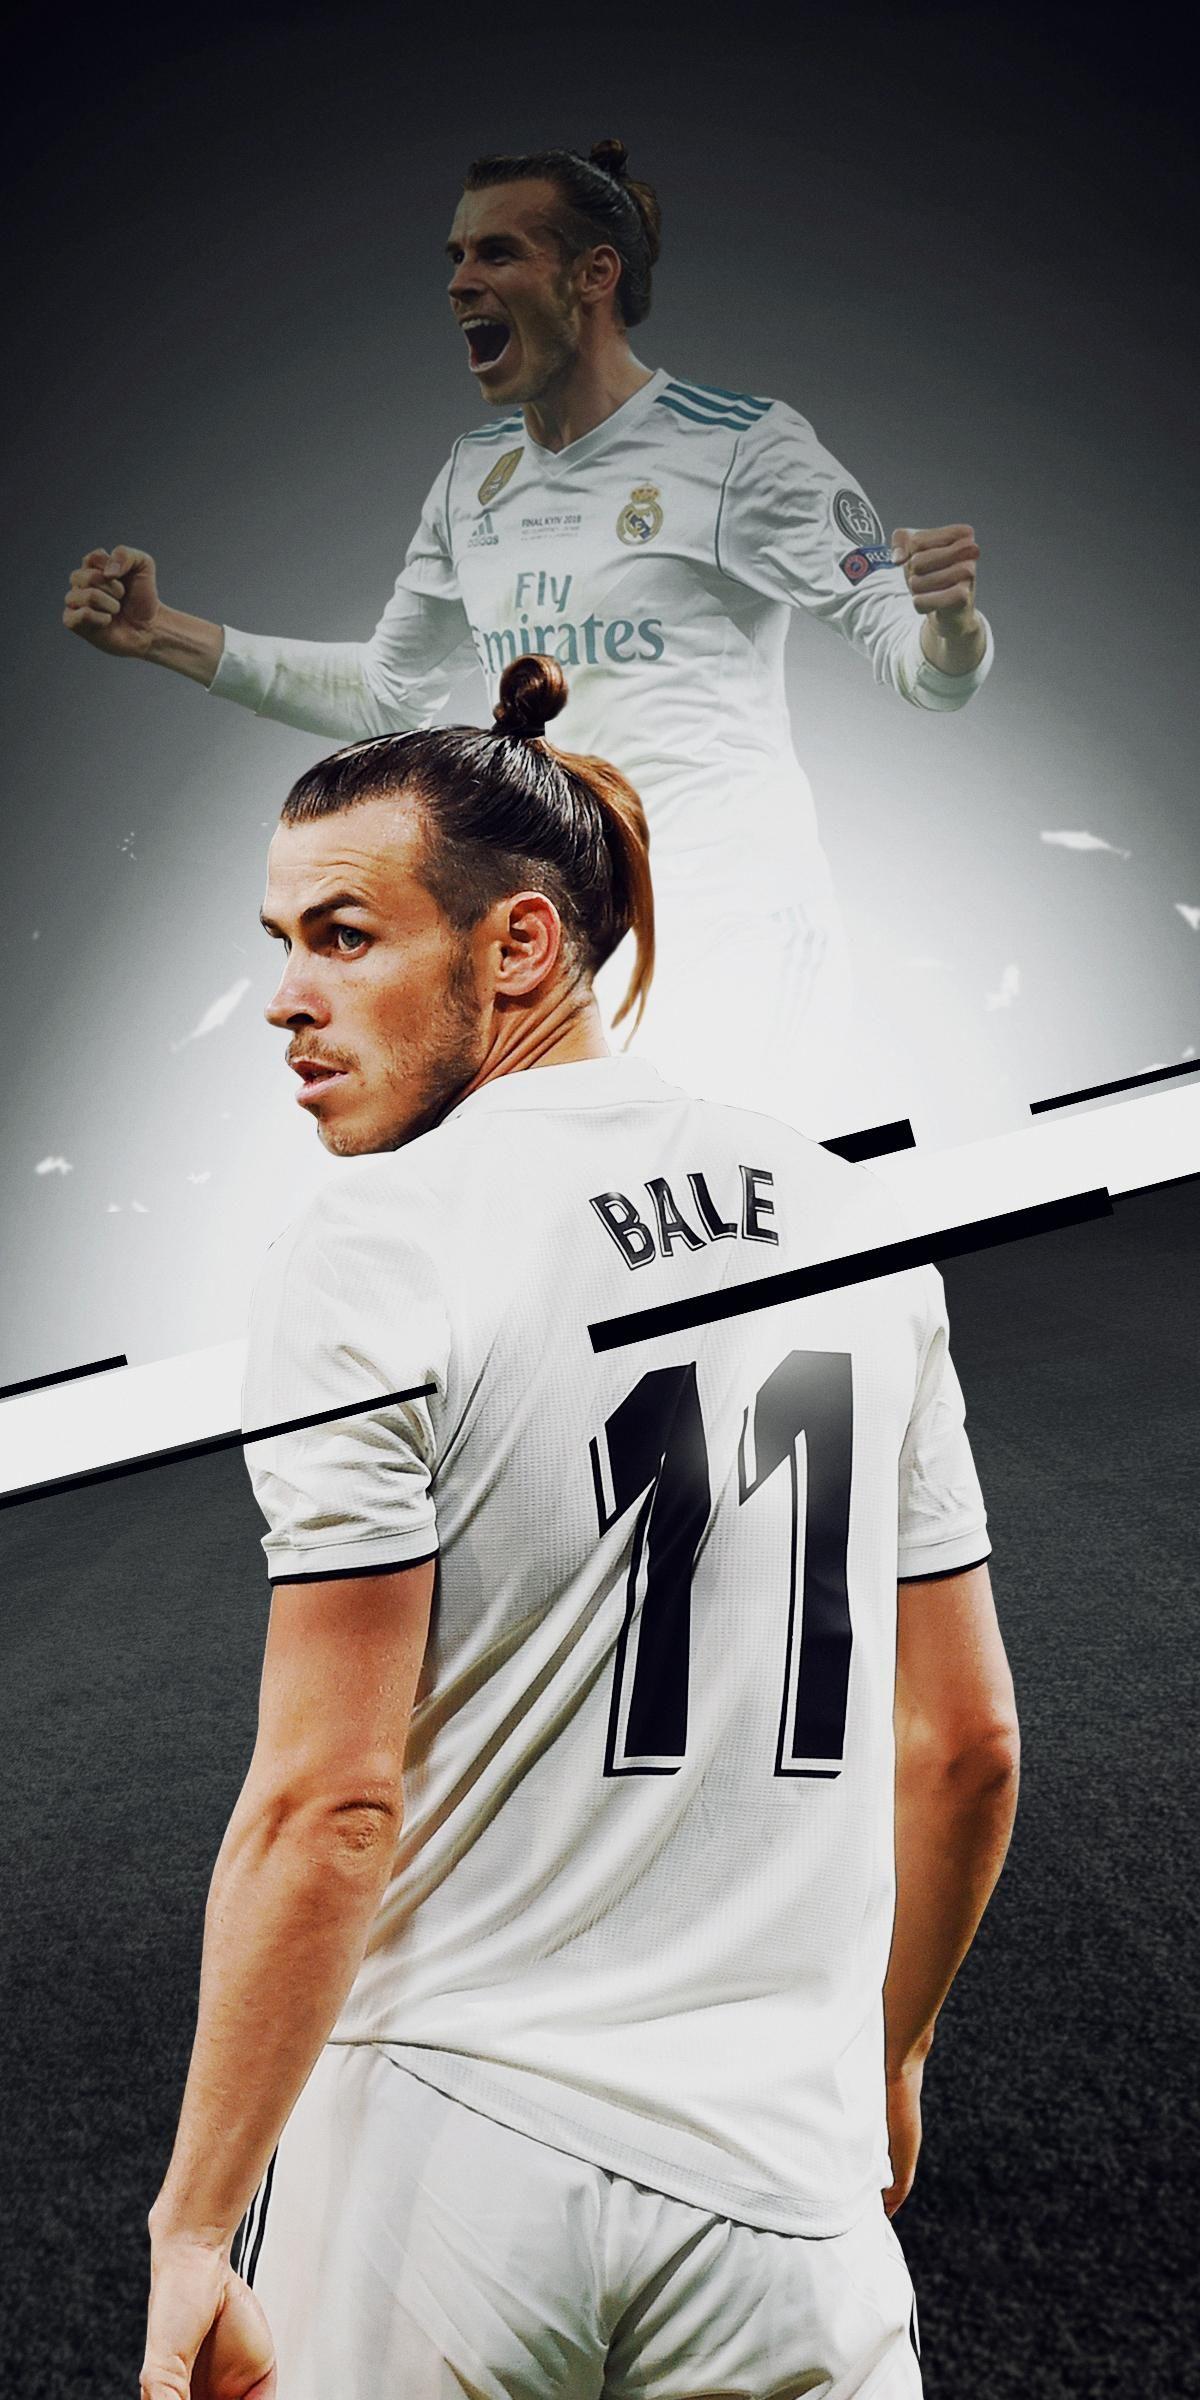 Gareth Bale Wallpaper Gareth Bale Real Madrid Wallpapers Real Madrid Football